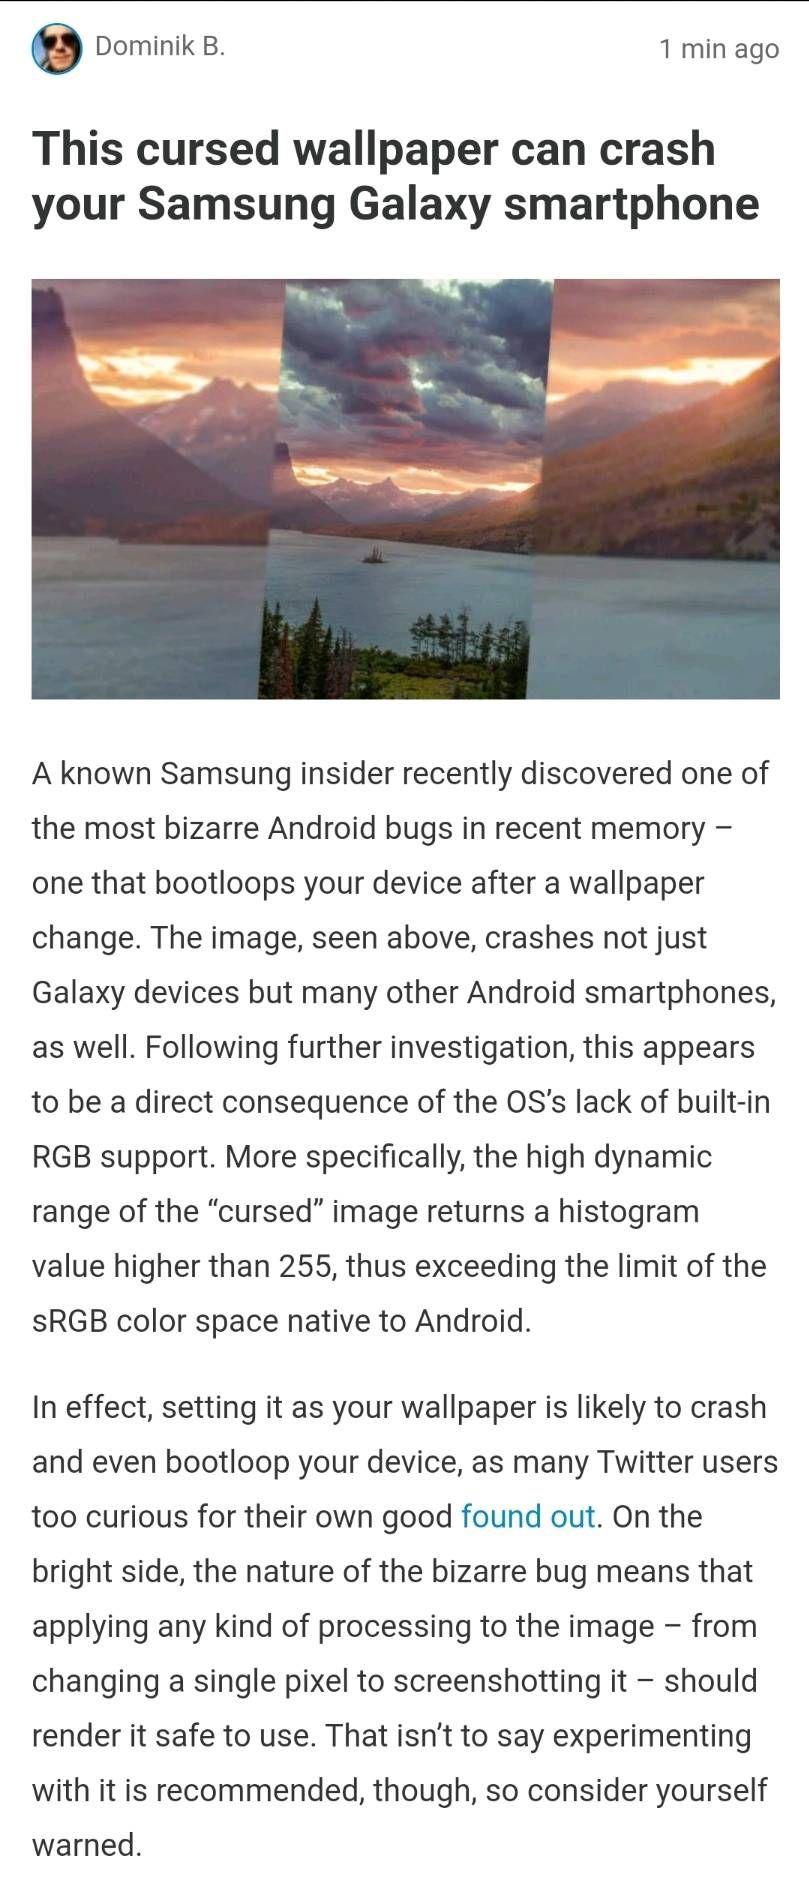 Update On The Crashing Wallpaper Samsung Members